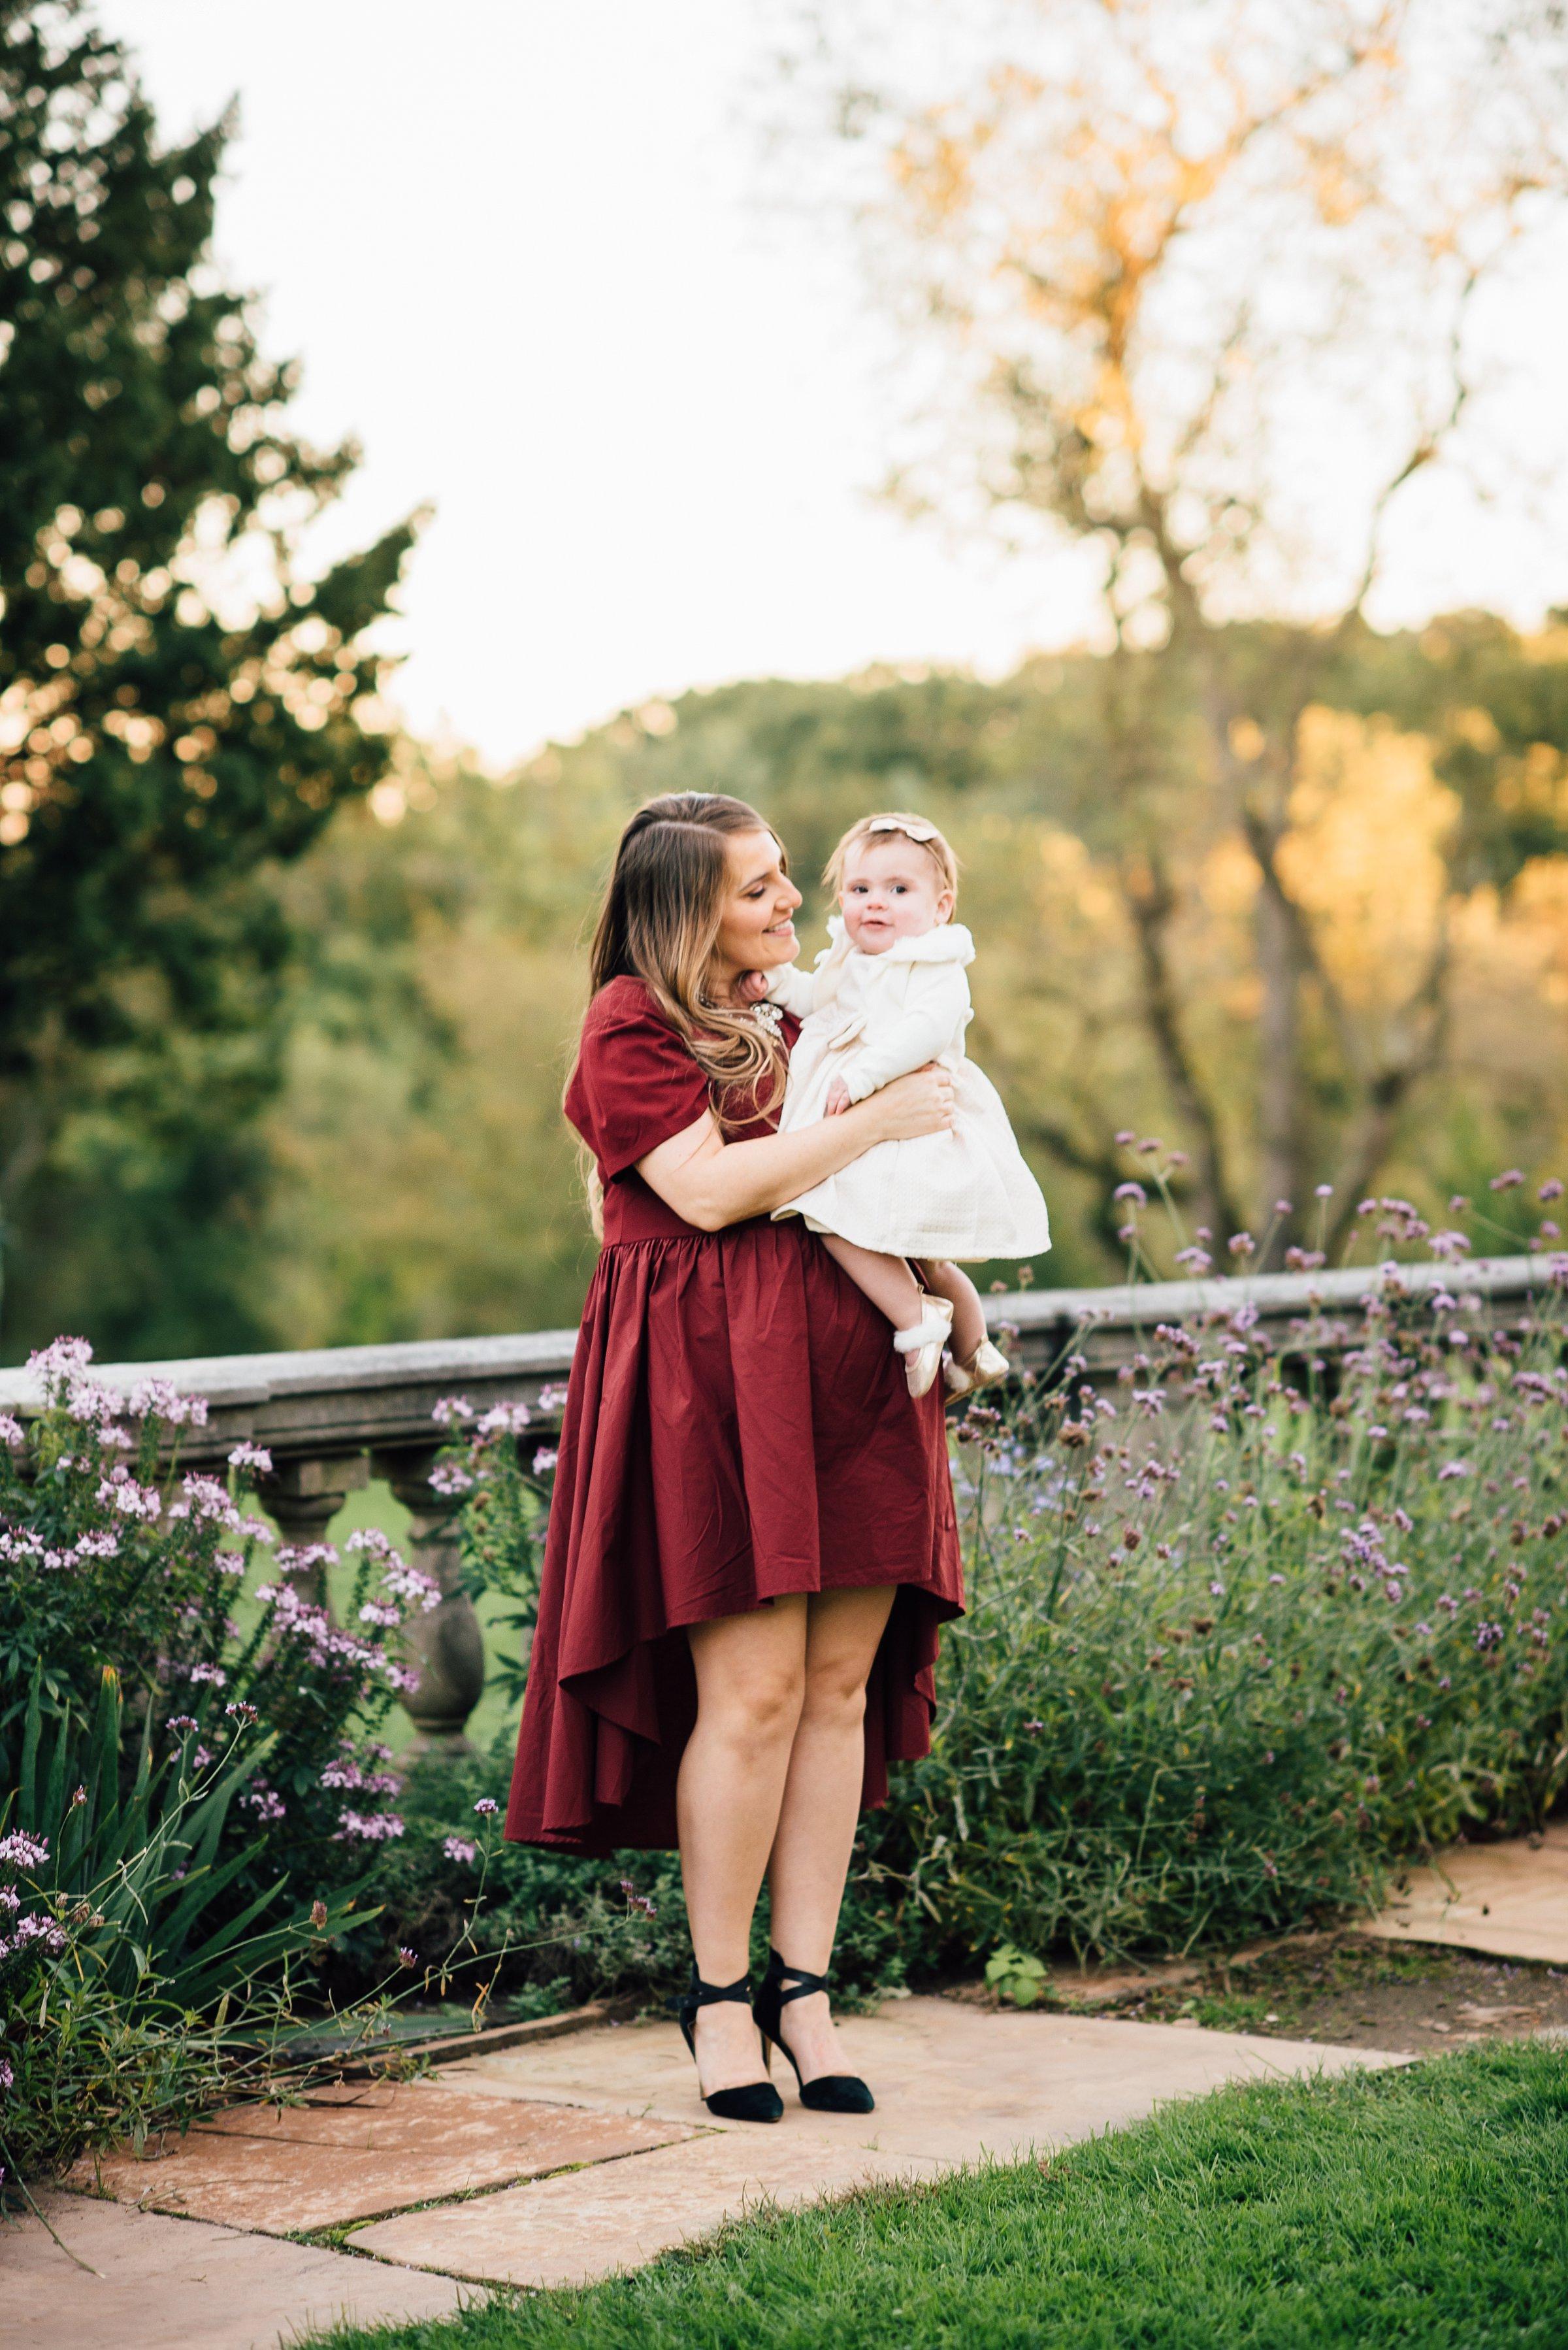 Family Photography Hartwood Acres Mansion Pittsburgh Rachel Rossetti_0331.jpg